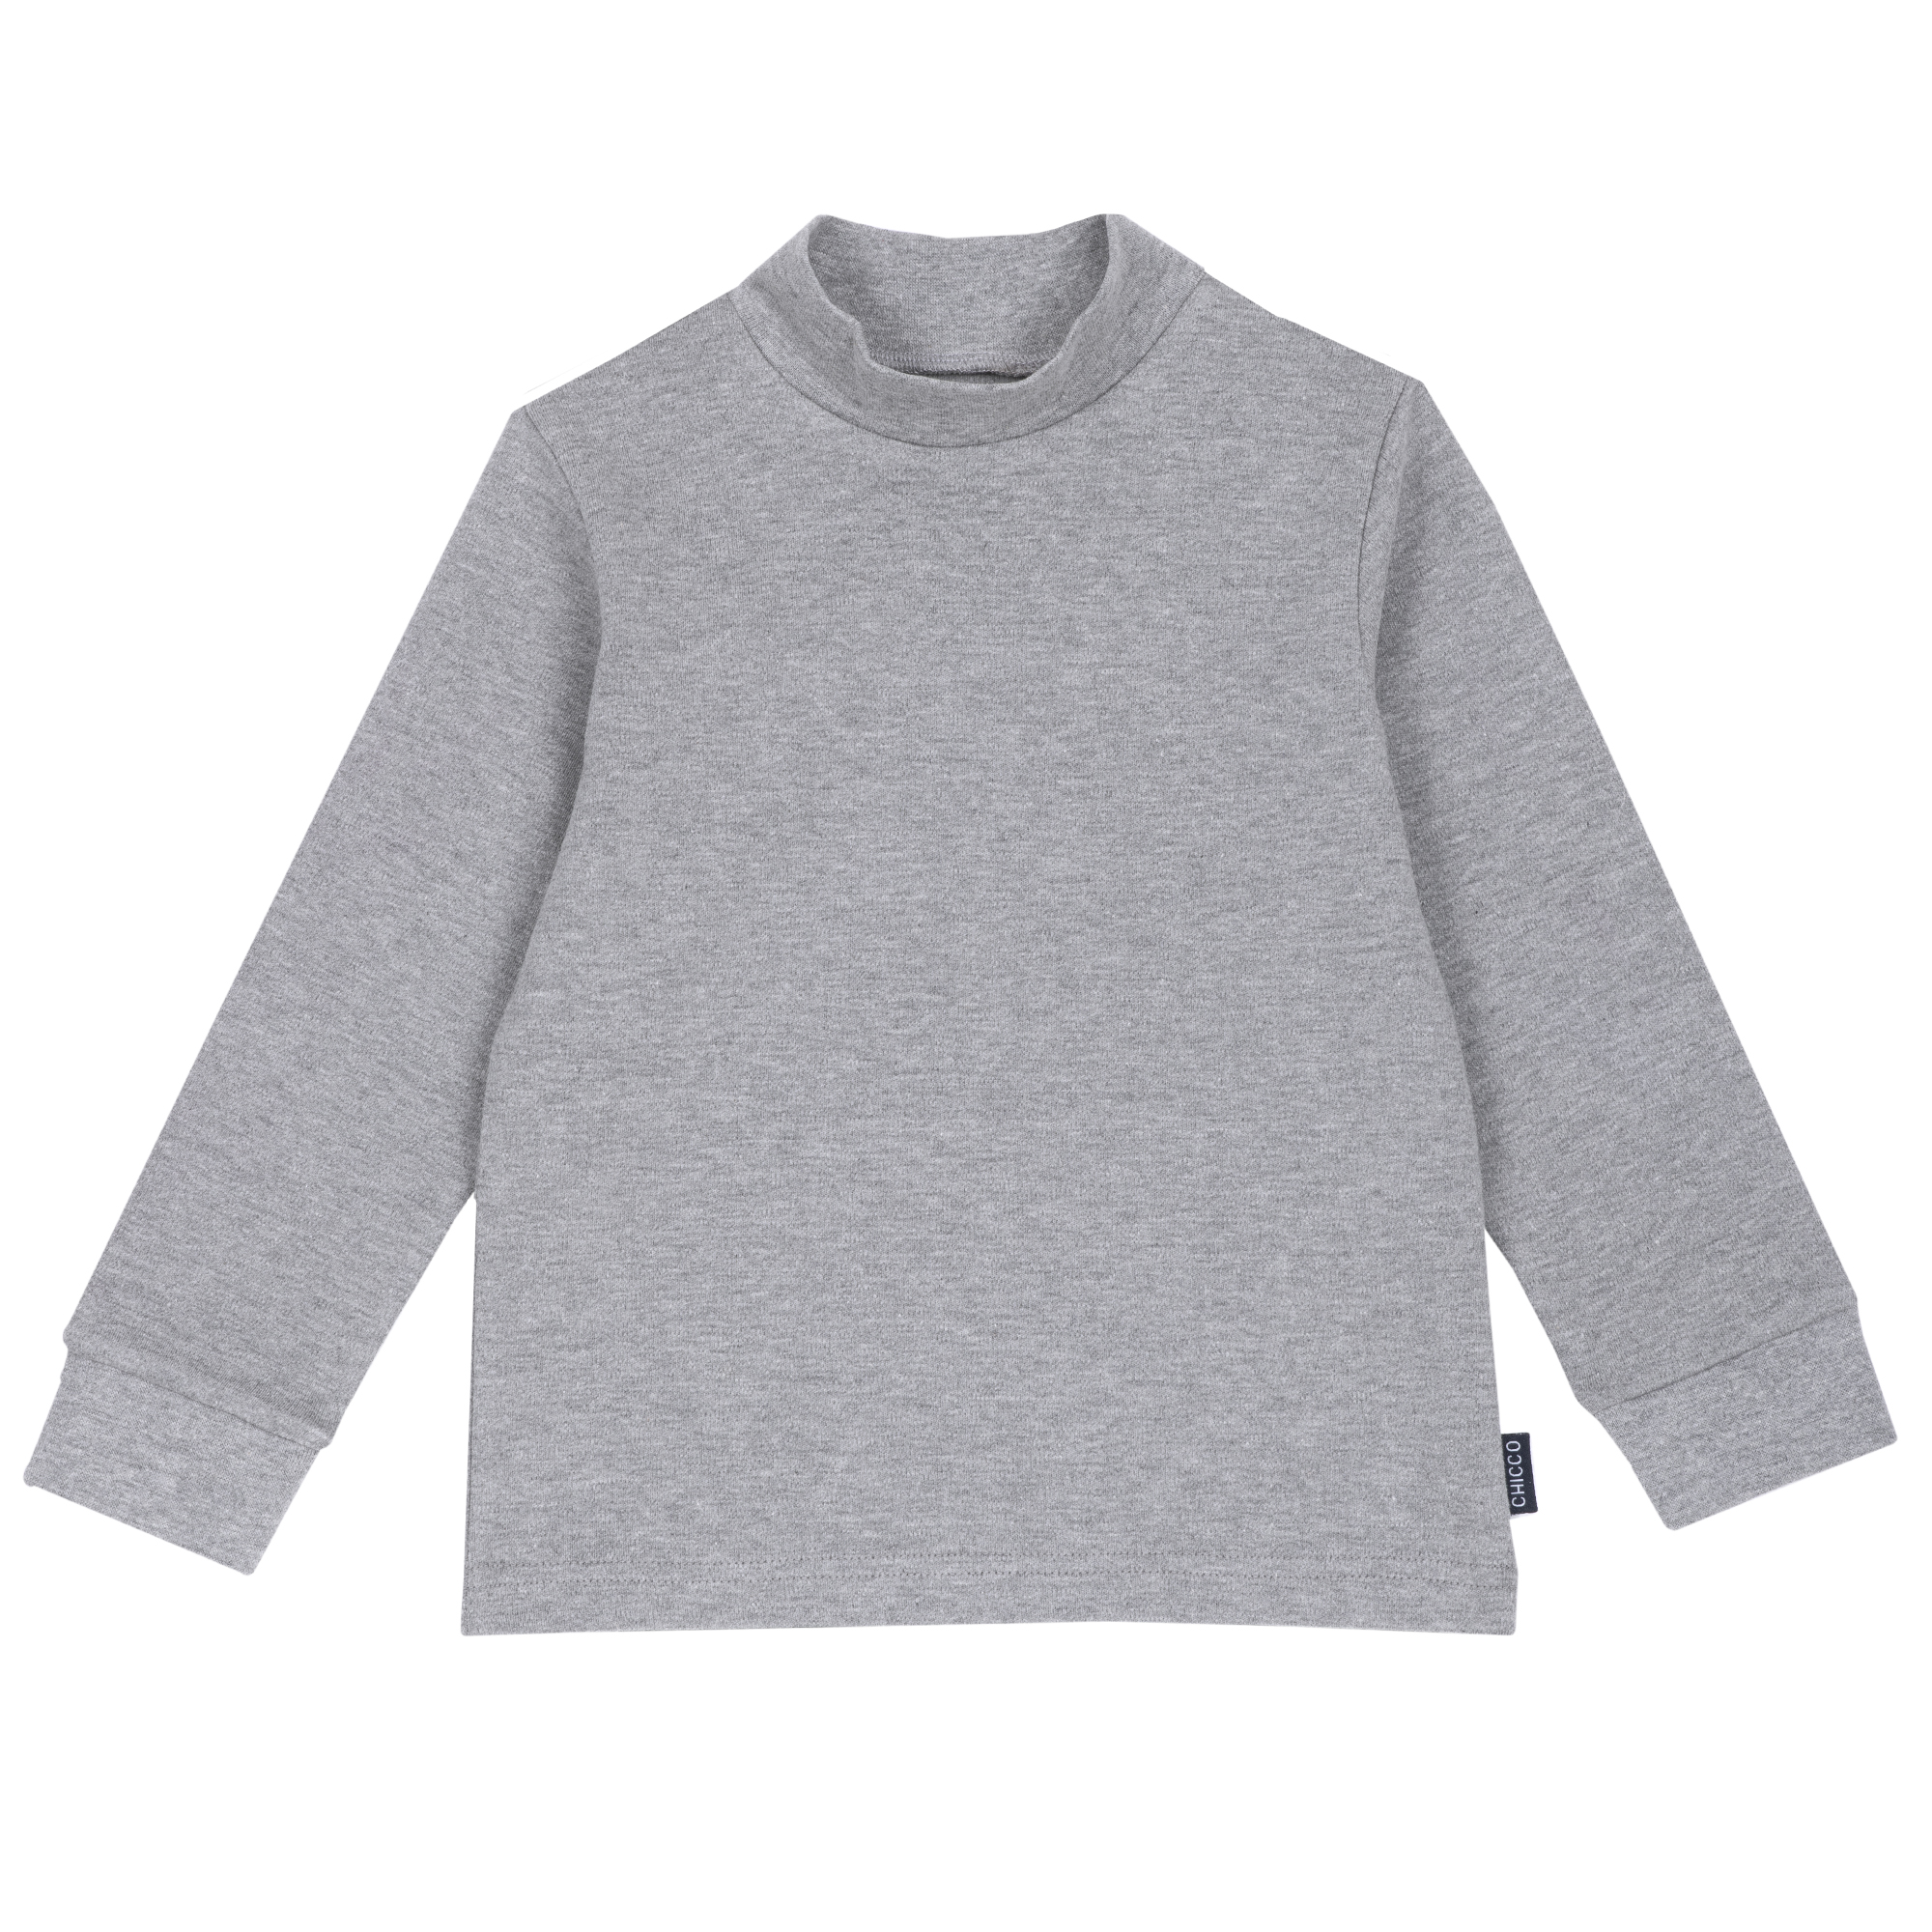 Tricou copii Chicco, gri, 06538